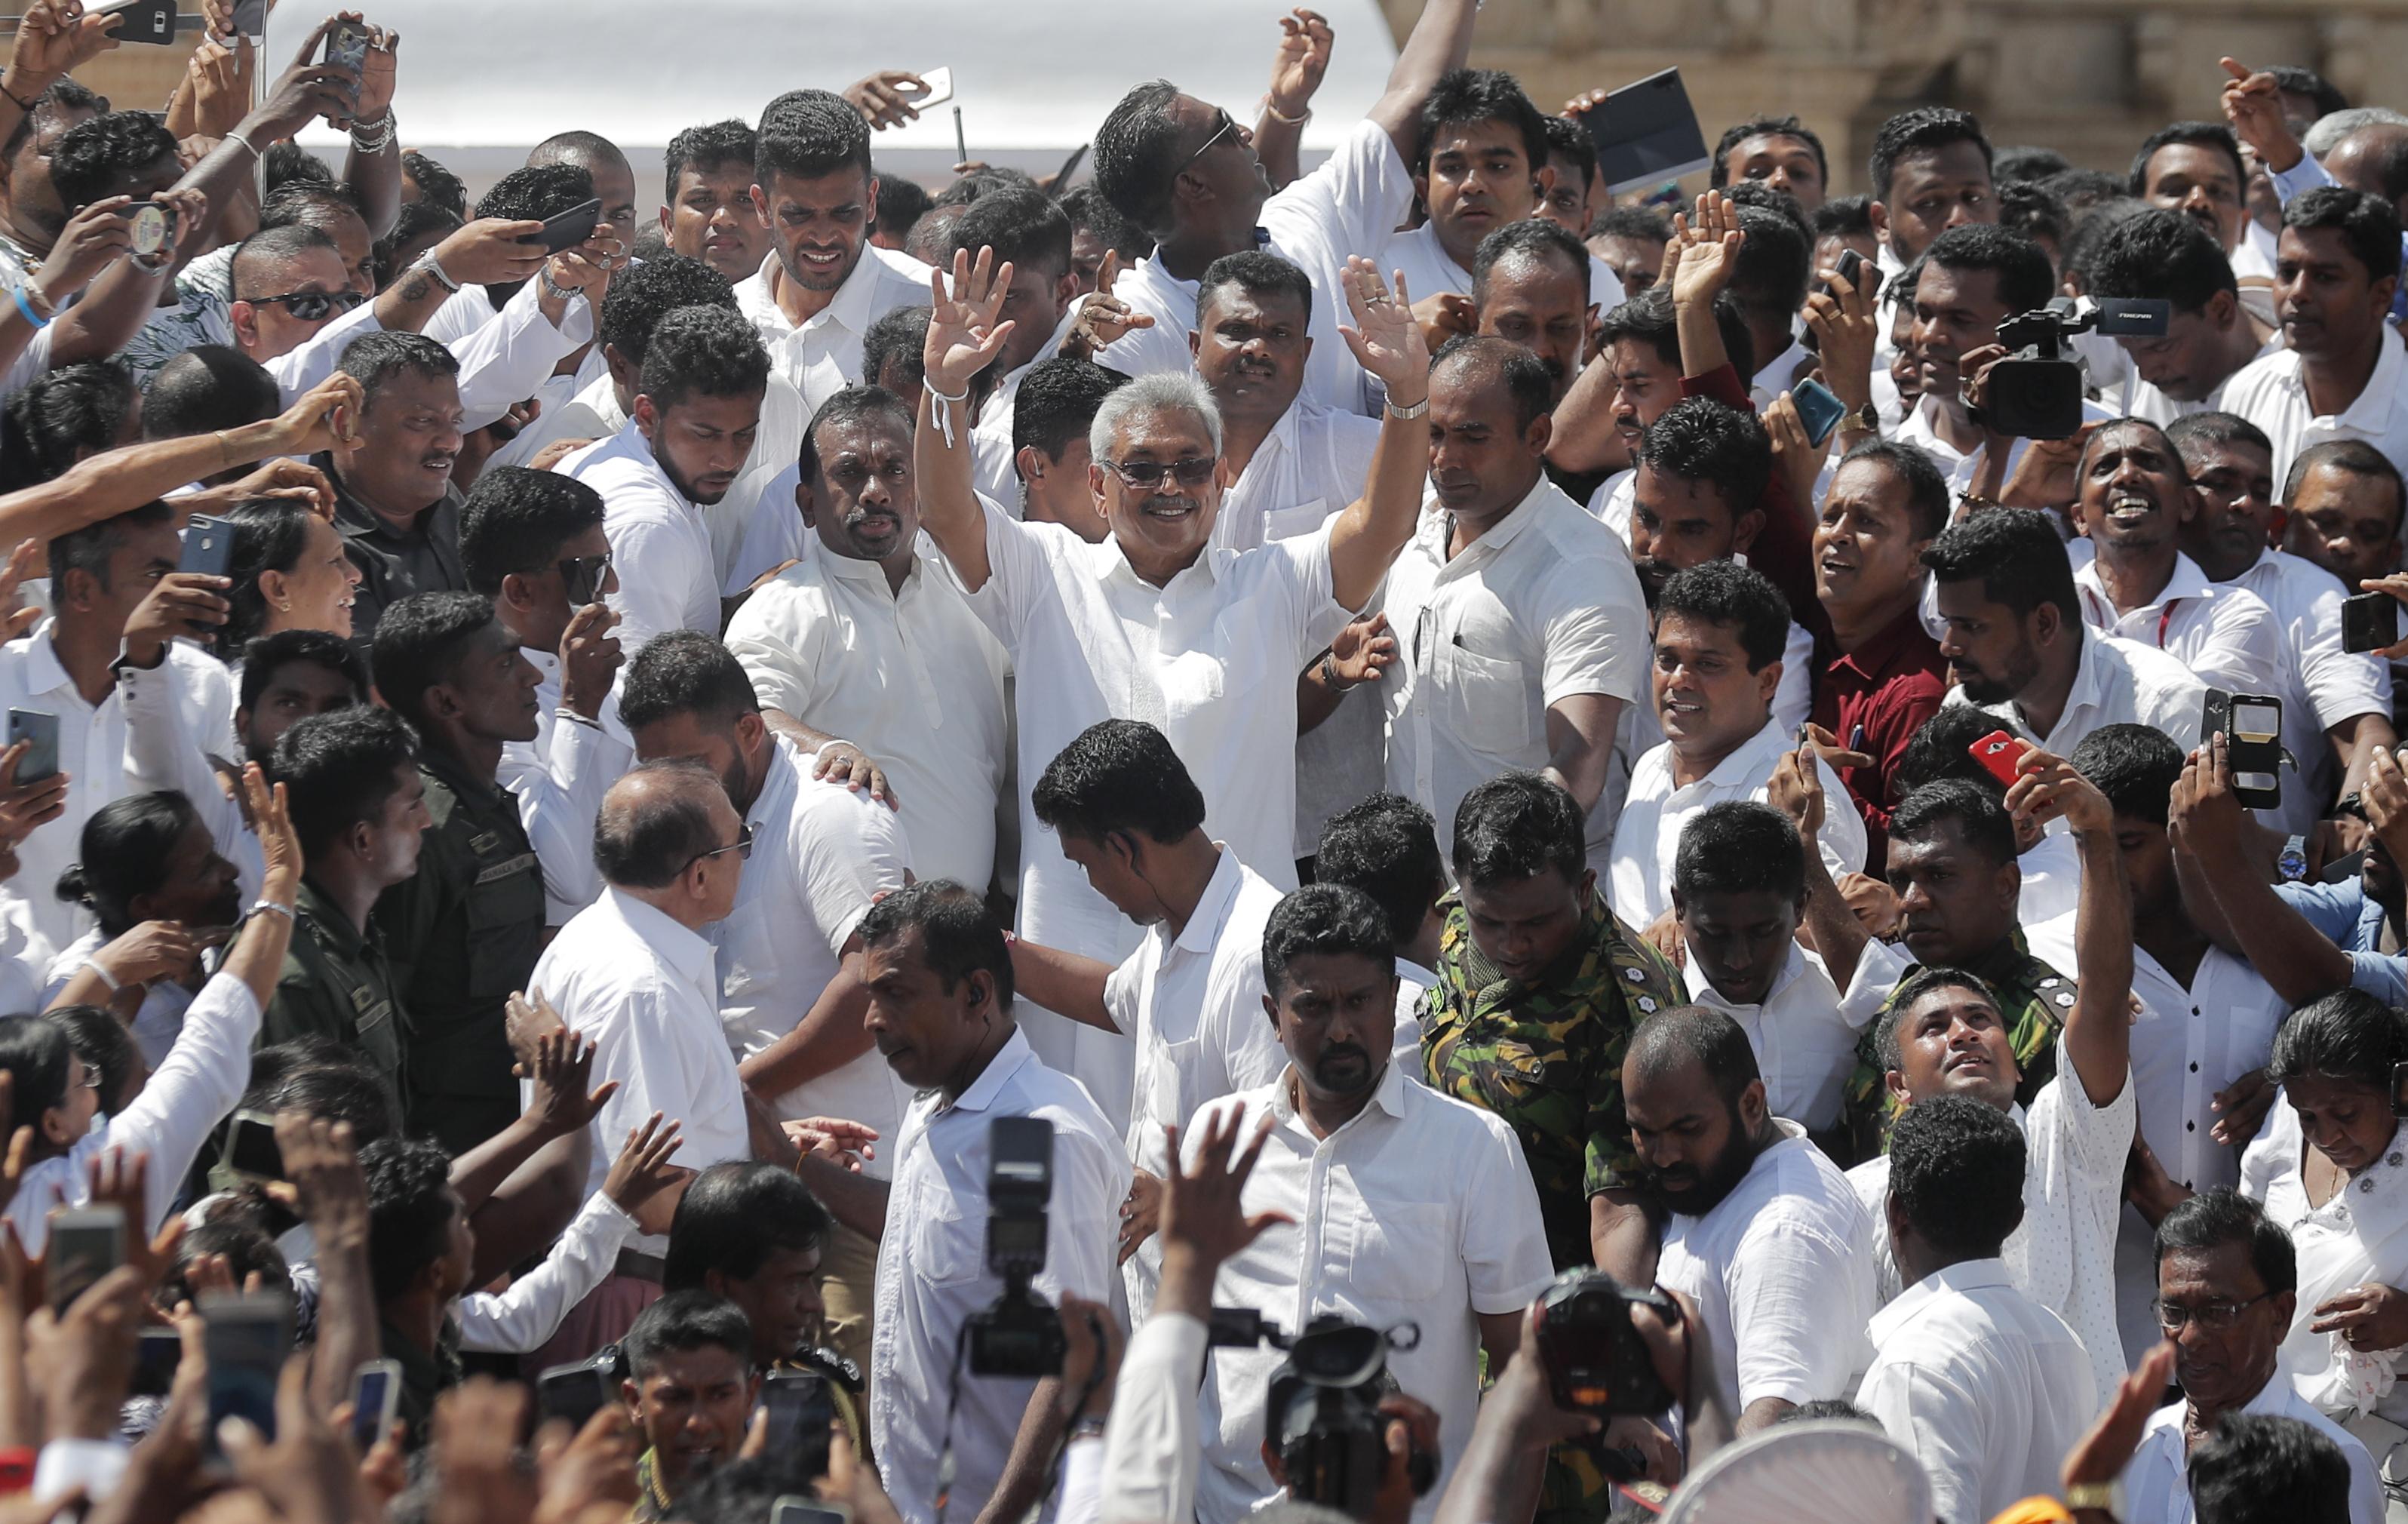 Gotabaya Rajapaksa, greets people as he leaves after the swearing in ceremony held at the 140 B.C Ruwanweli Seya Buddhist temple in ancient kingdom of Anuradhapura in north central Sri Lanka on November 18, 2019